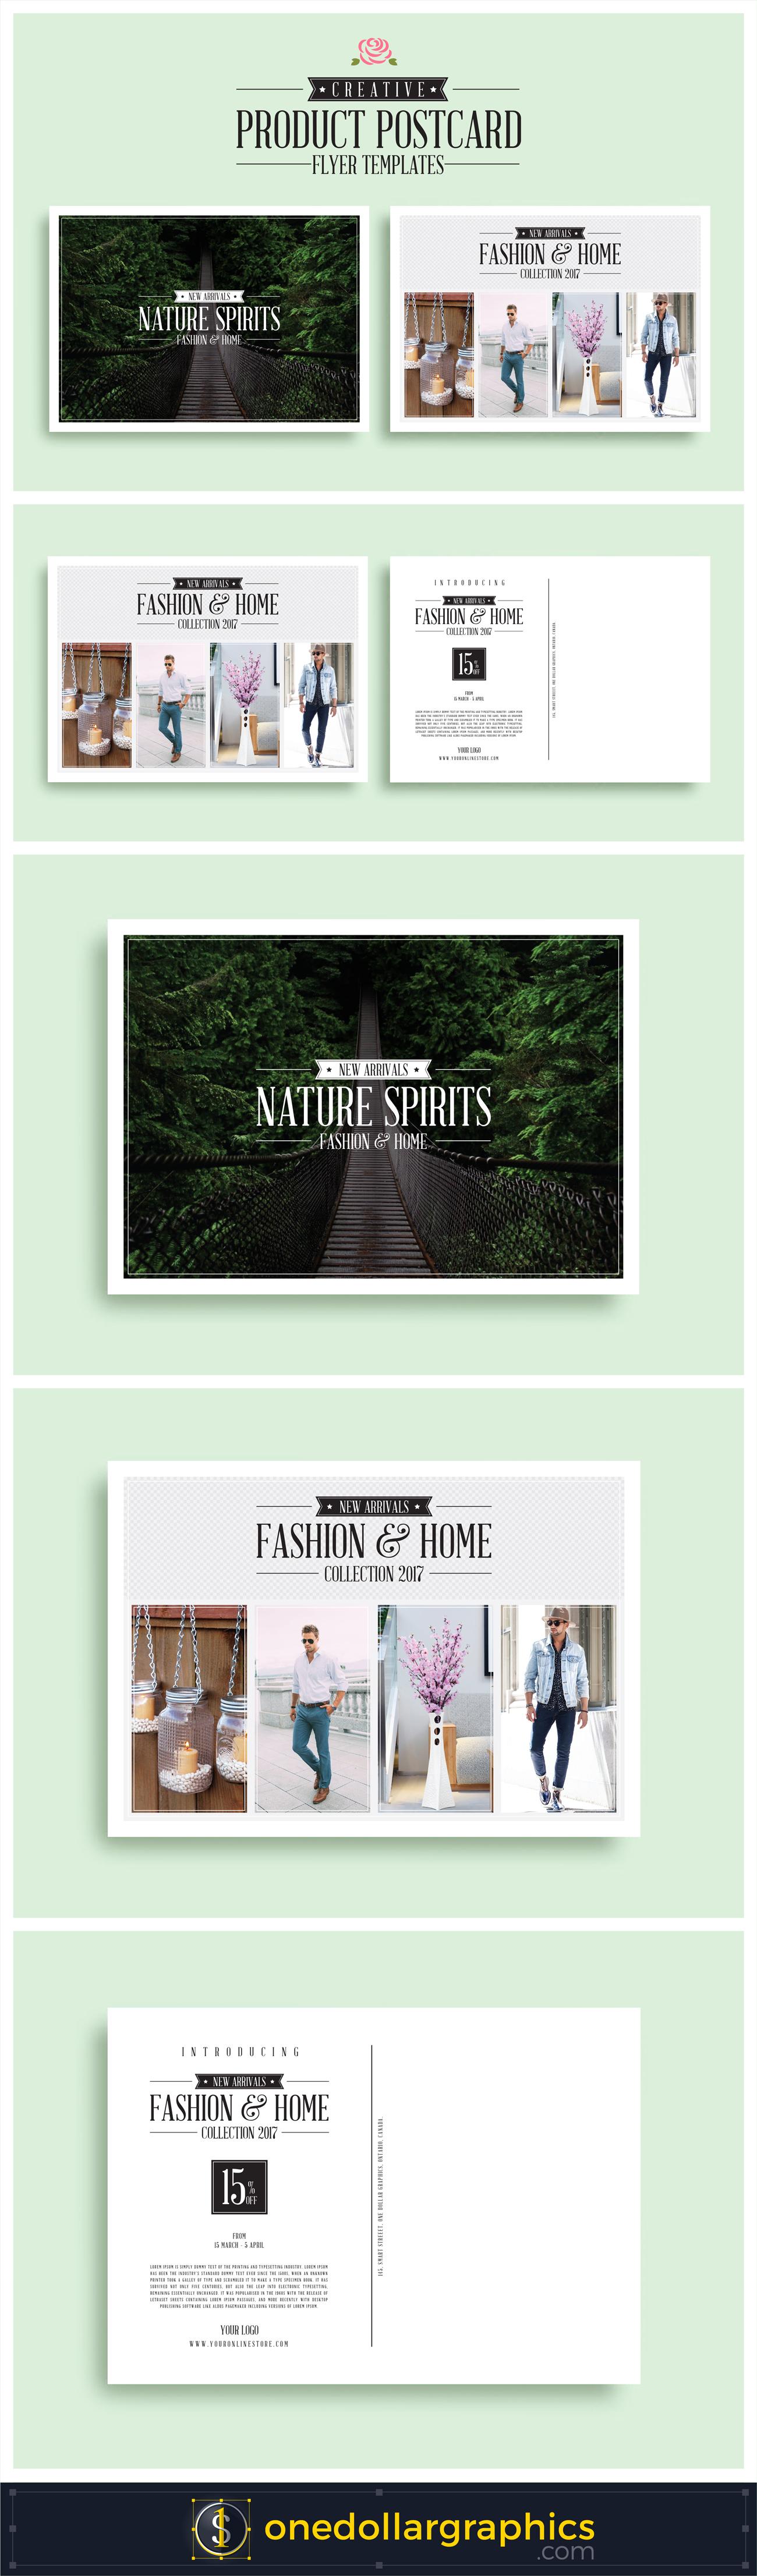 Creative-Product-Postcard-Flyer-Templates